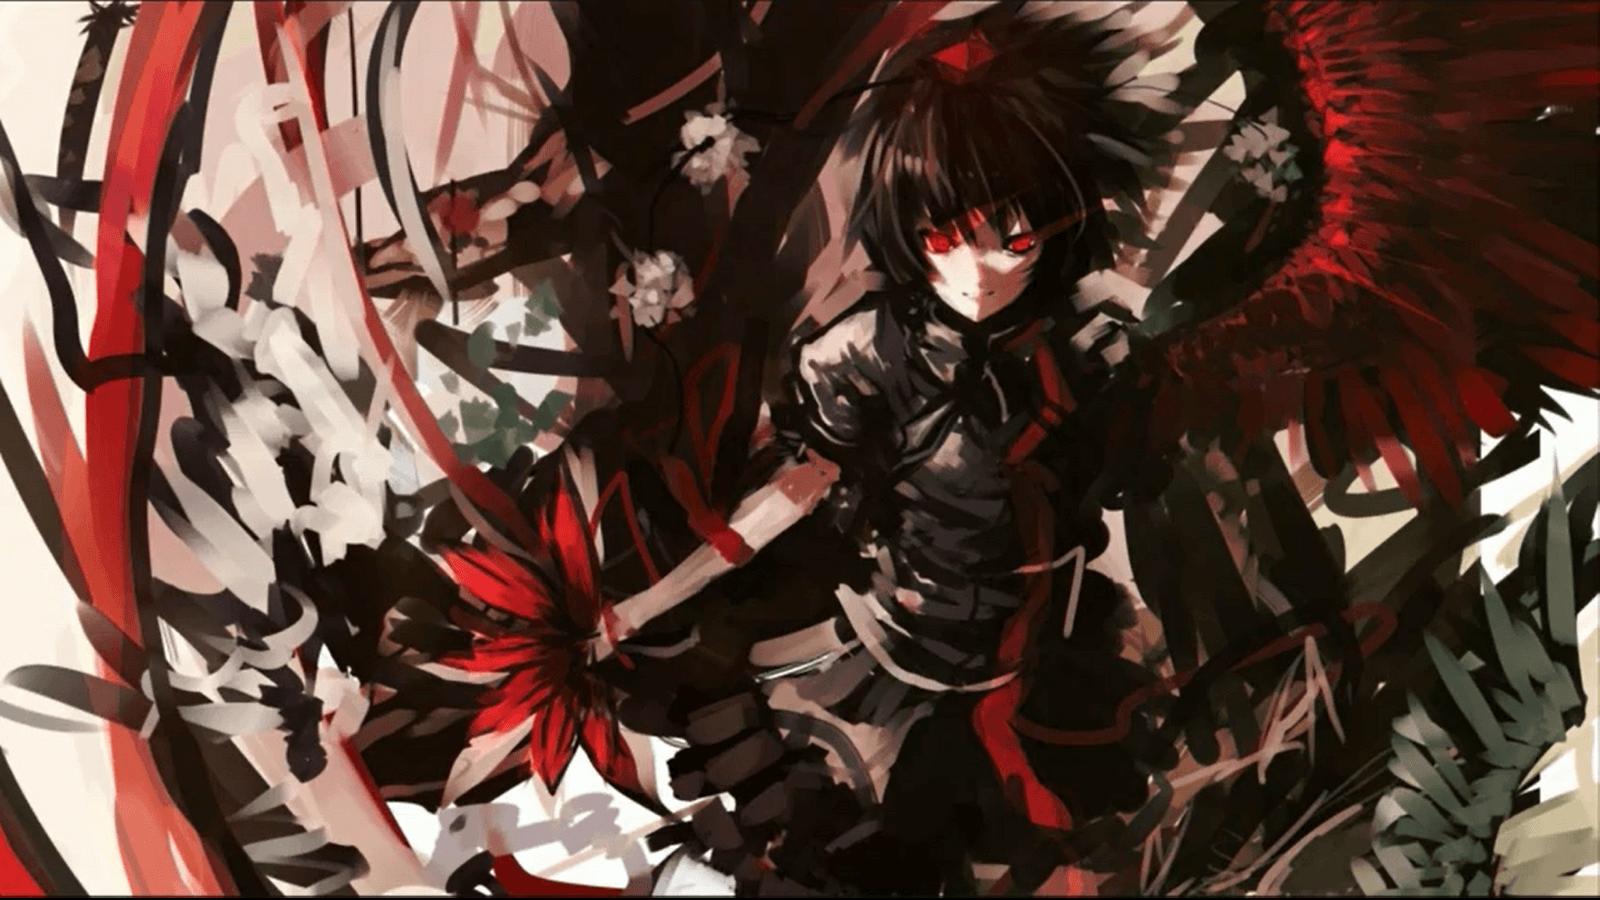 Pin By Naomi Uchiha On Nothing But Anime Pinterest Anime